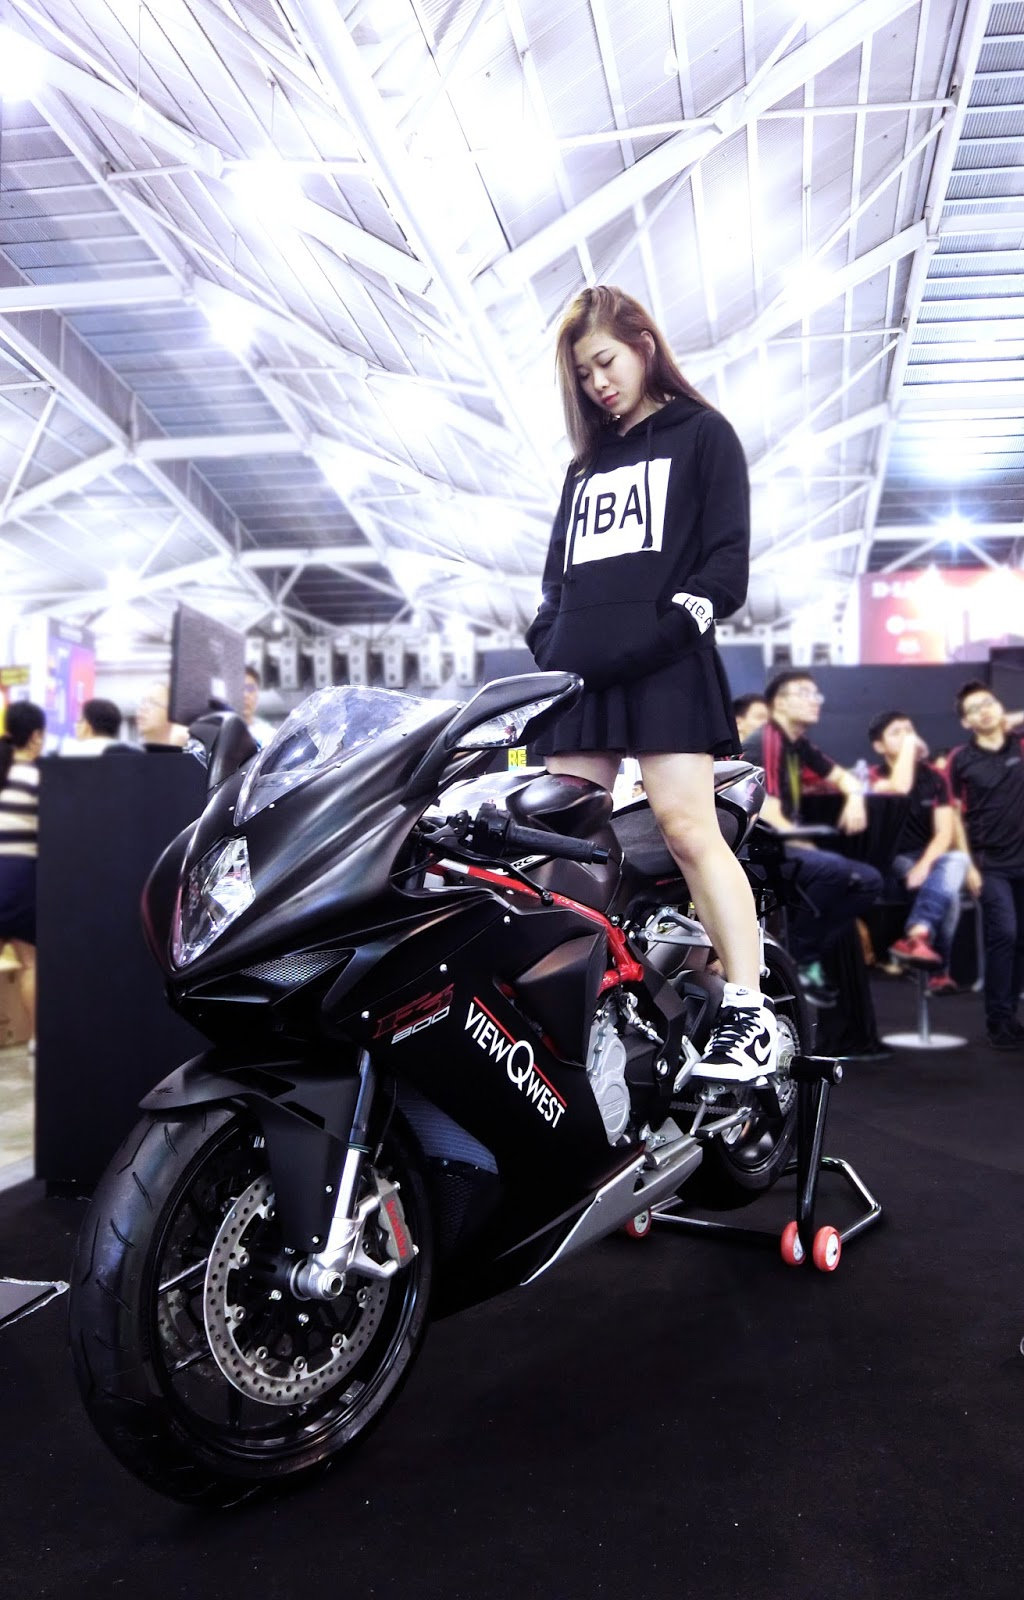 Vivian bike